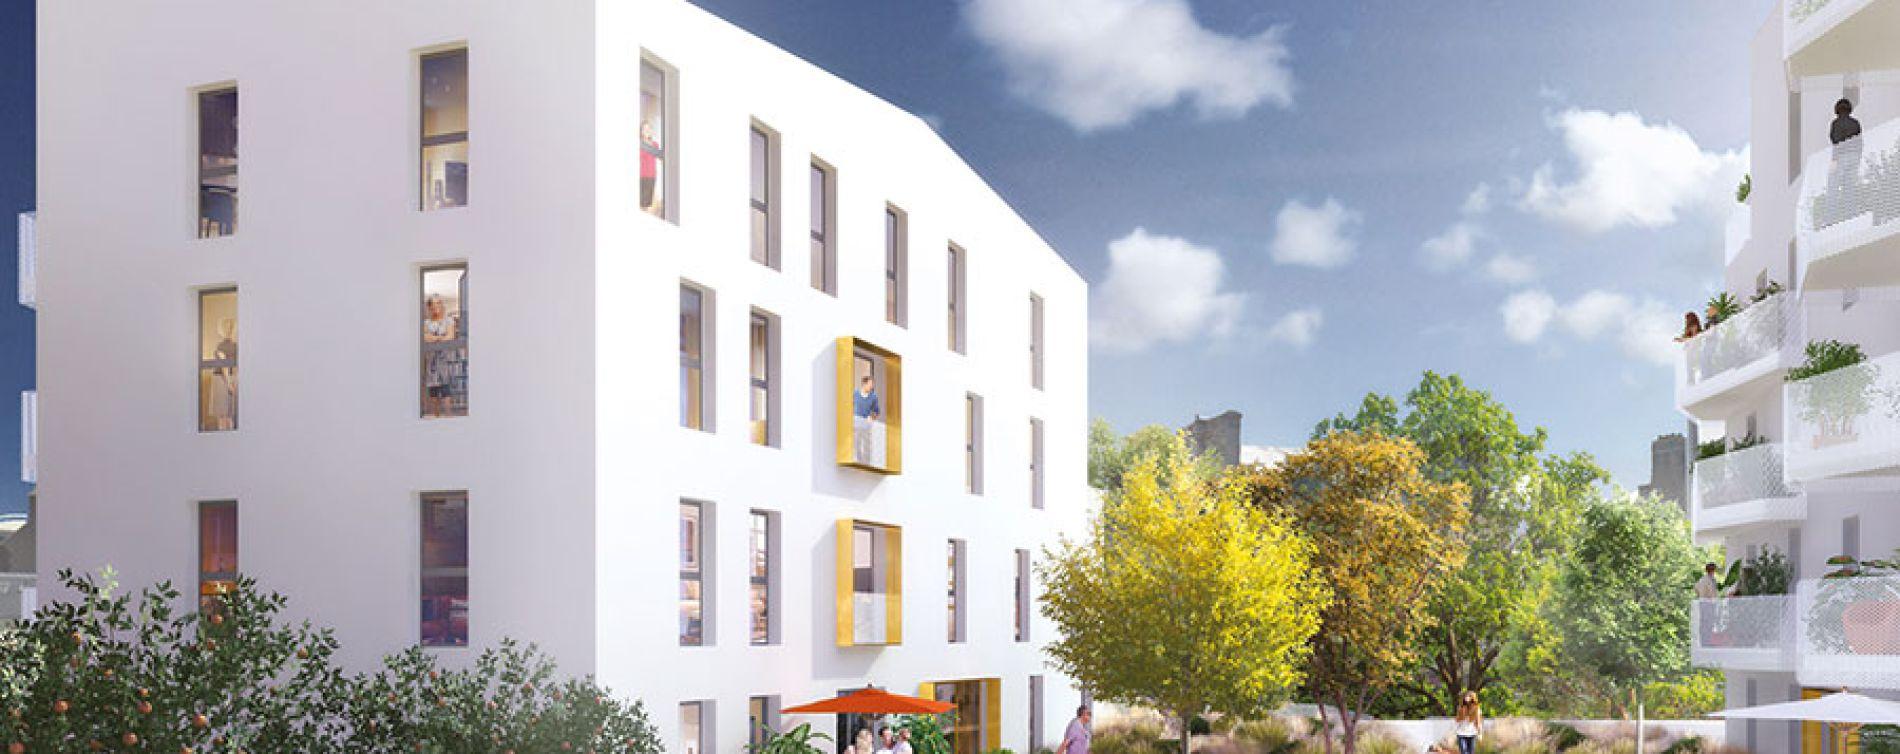 Résidence Les Jardins d'Ostara au Havre